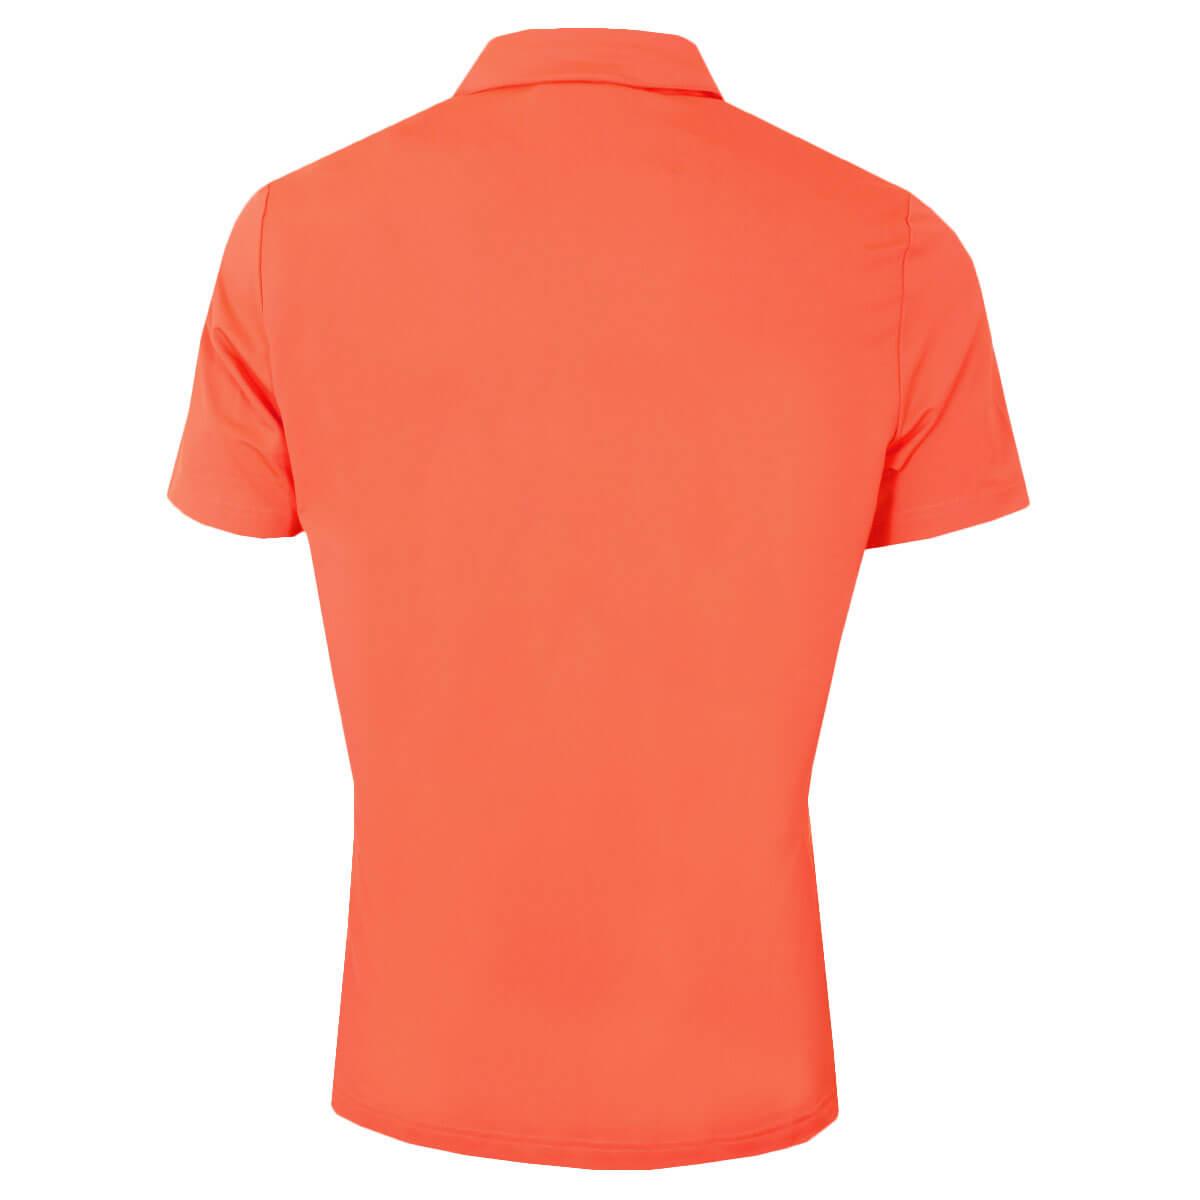 Adidas-Golf-Men-039-s-Ultimate-2-0-Solid-Crestable-Polo-Shirt thumbnail 9